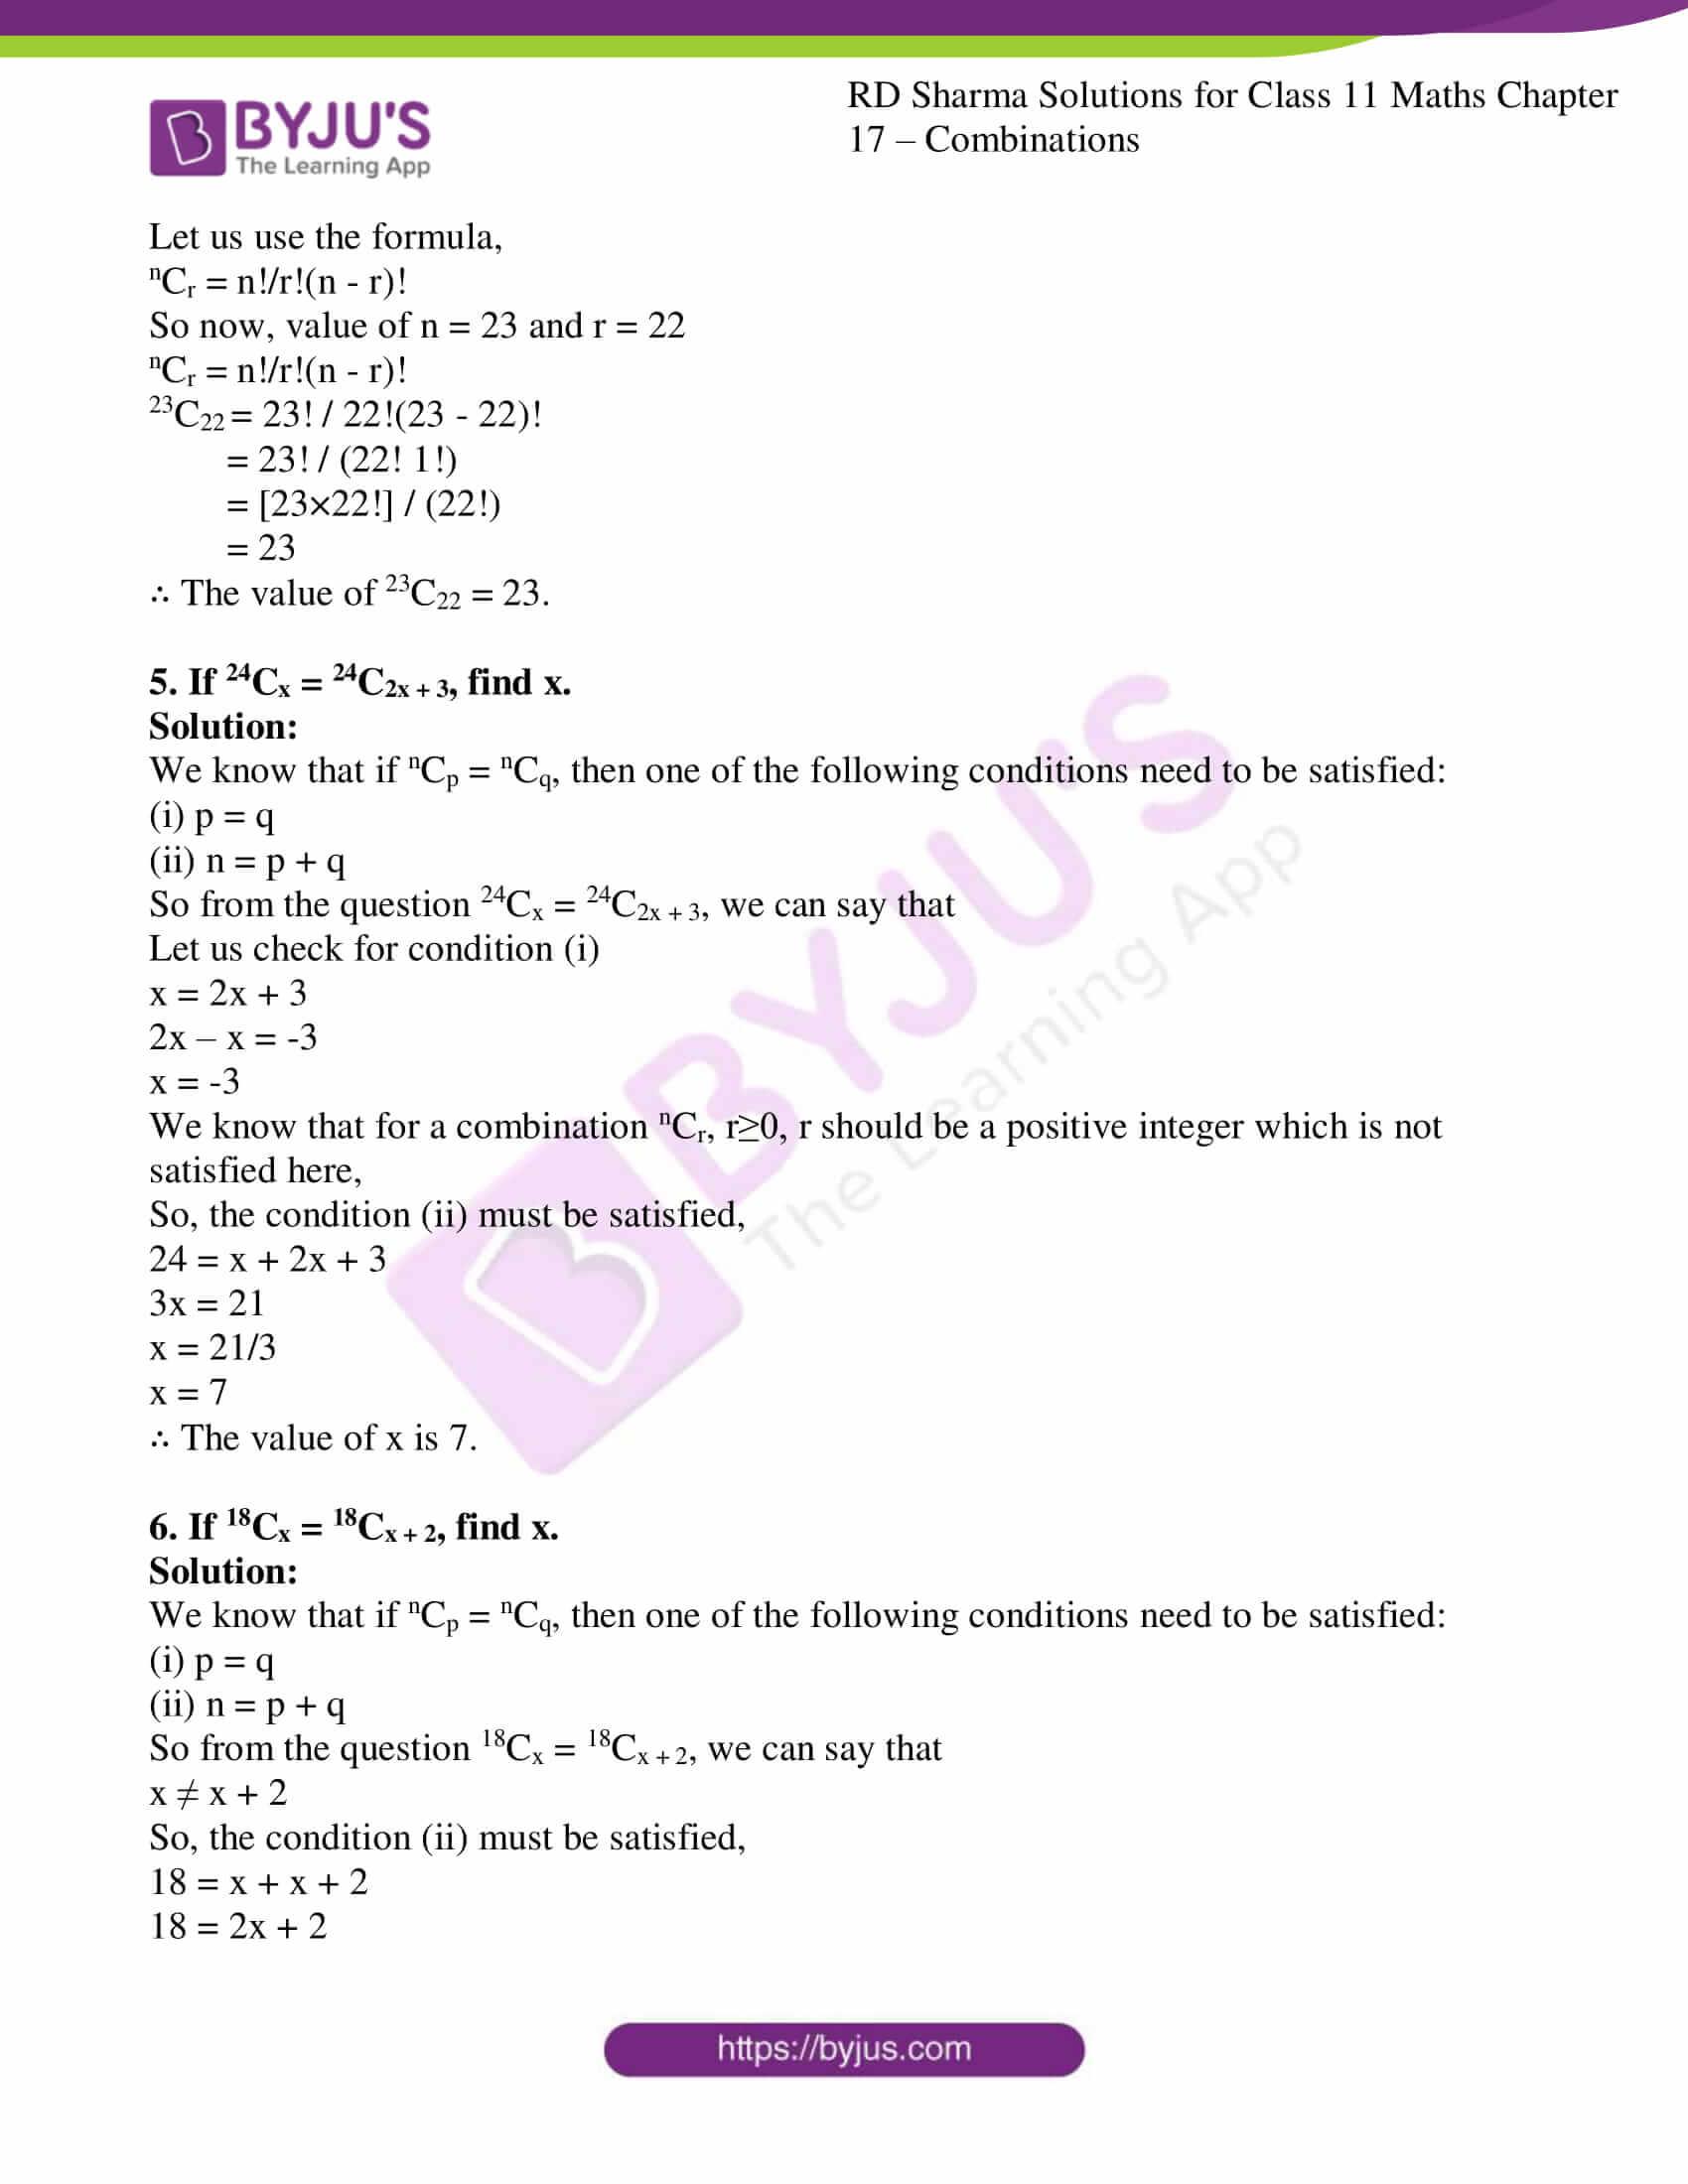 rd sharma class 11 maths ch 17 ex 1 4